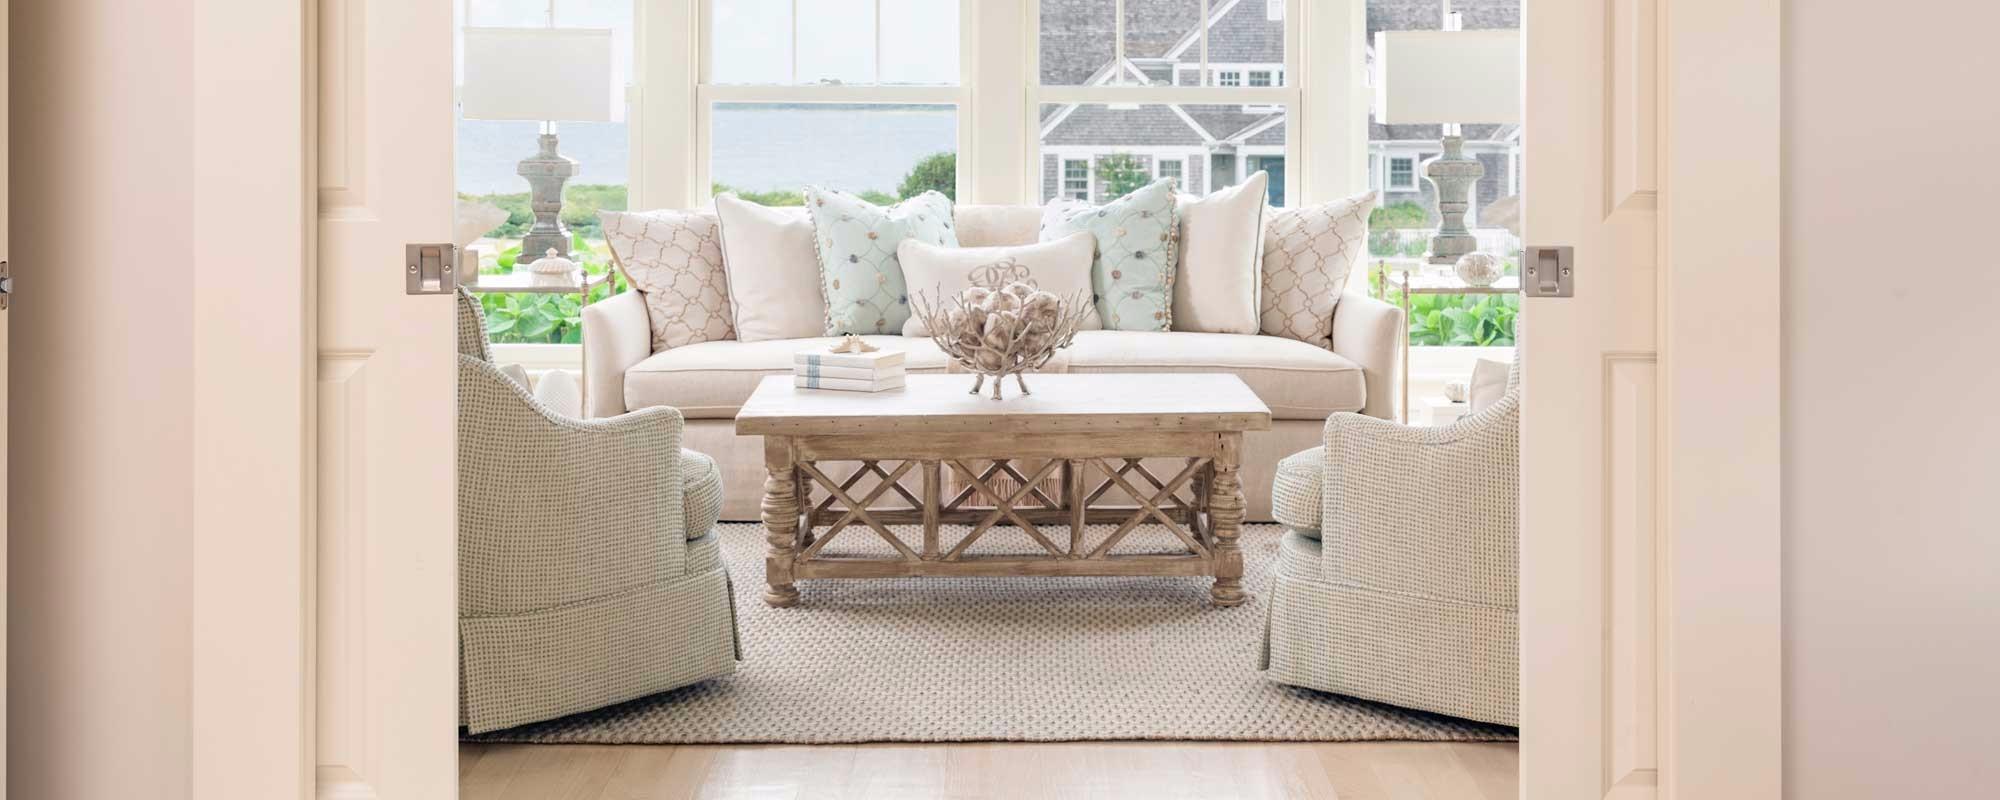 custom-sofa-and-pillows